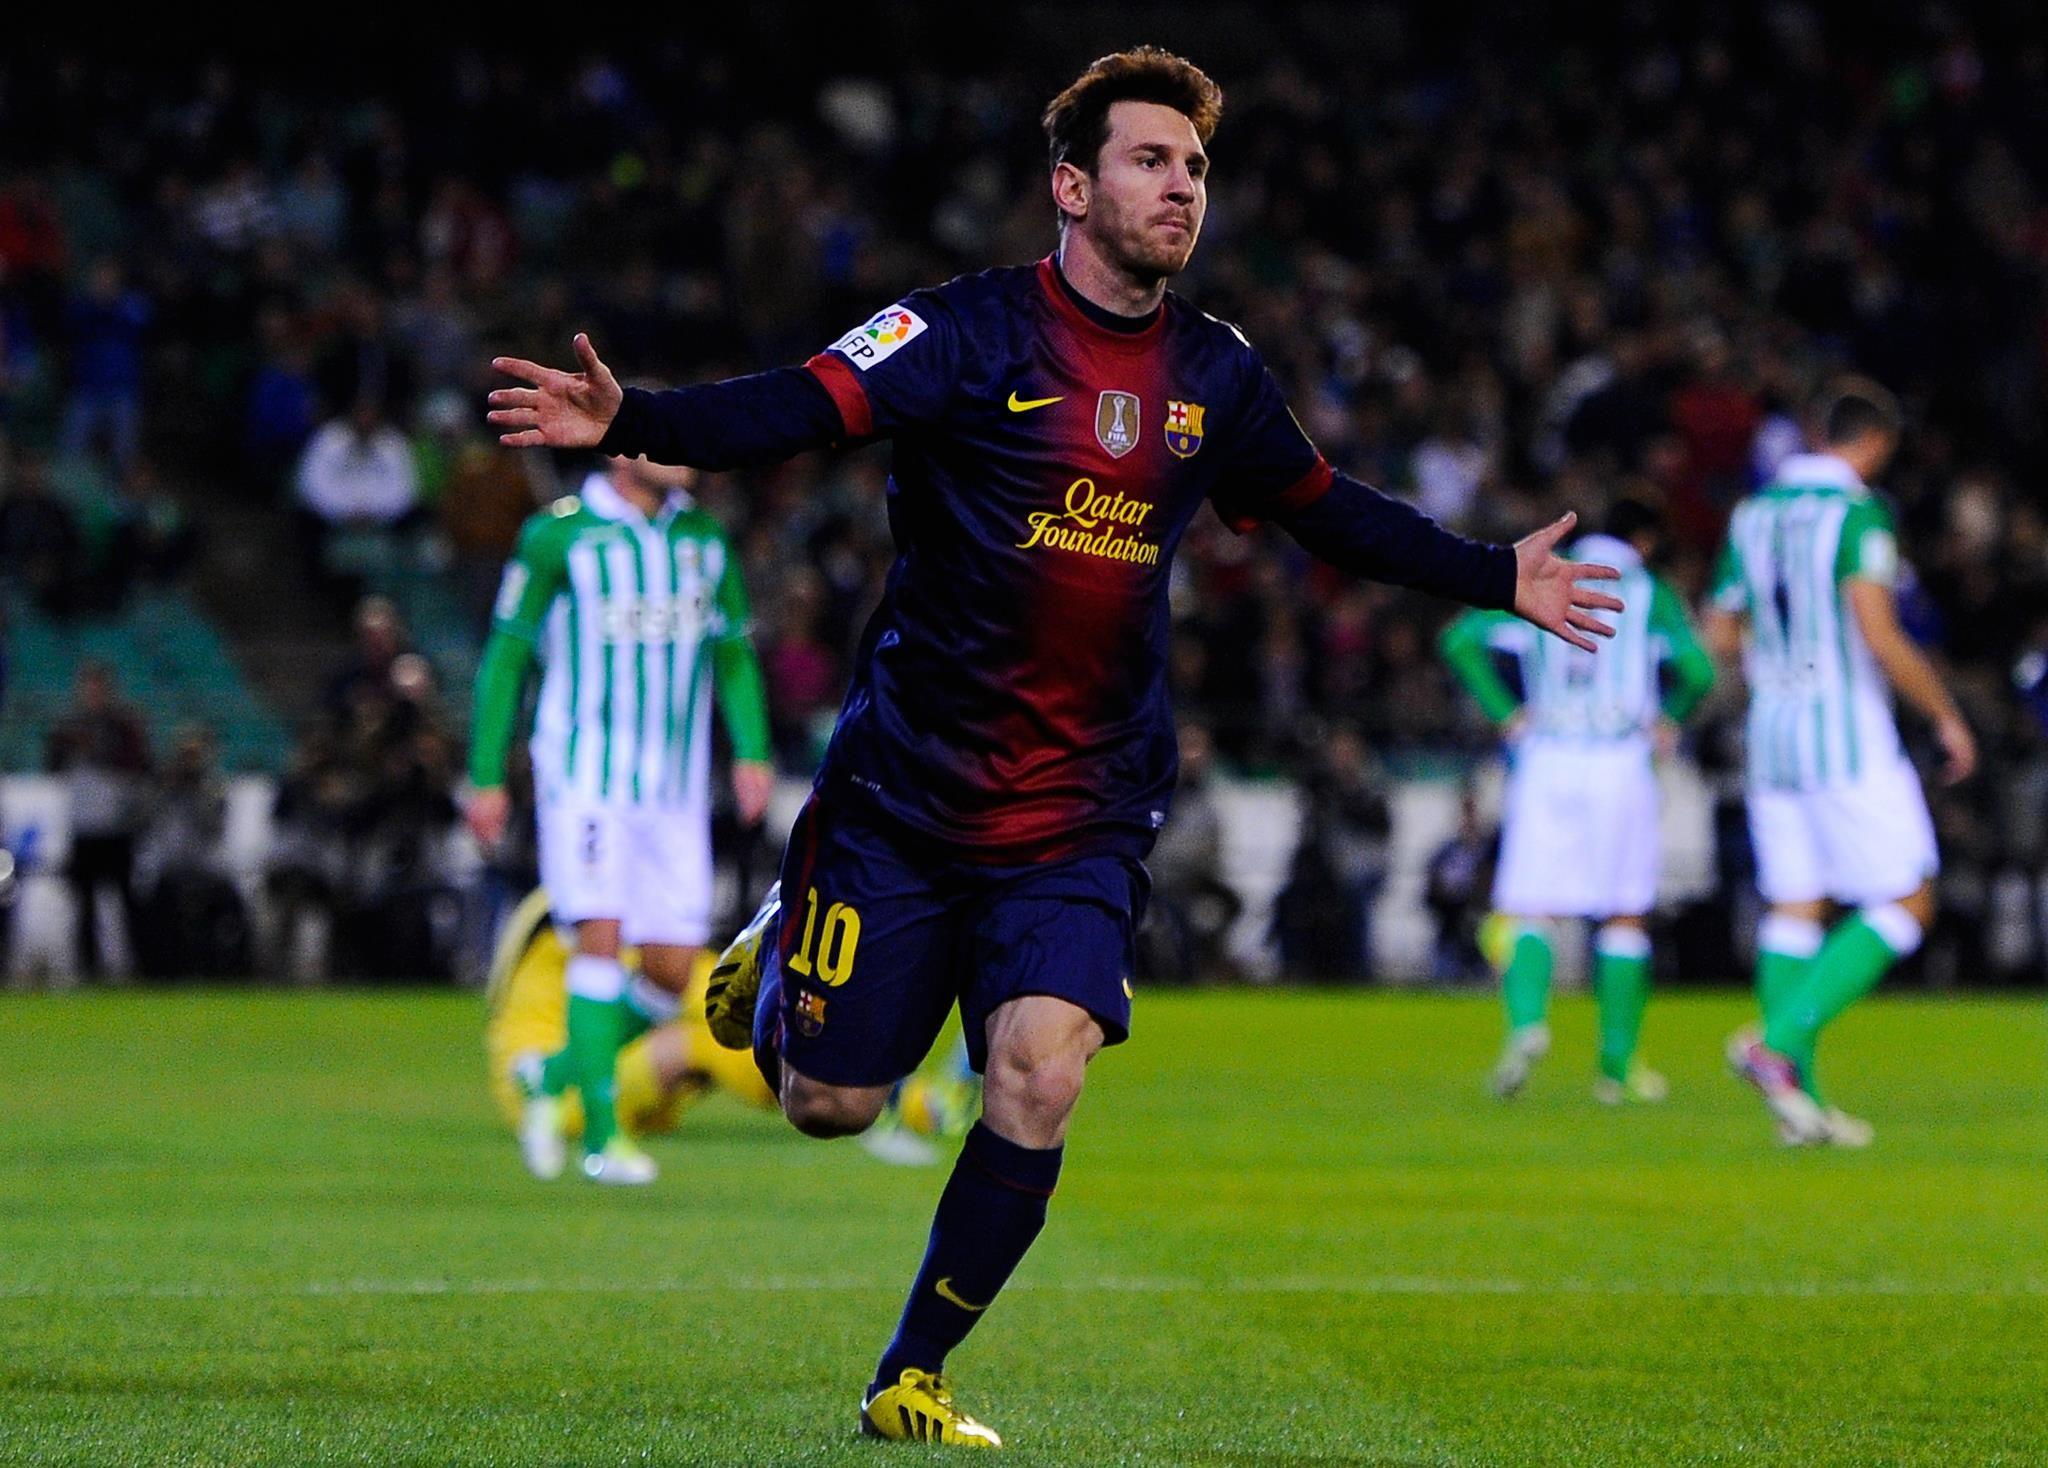 lionel messi new jersey 2012-2013 barcelona barcelona hd best